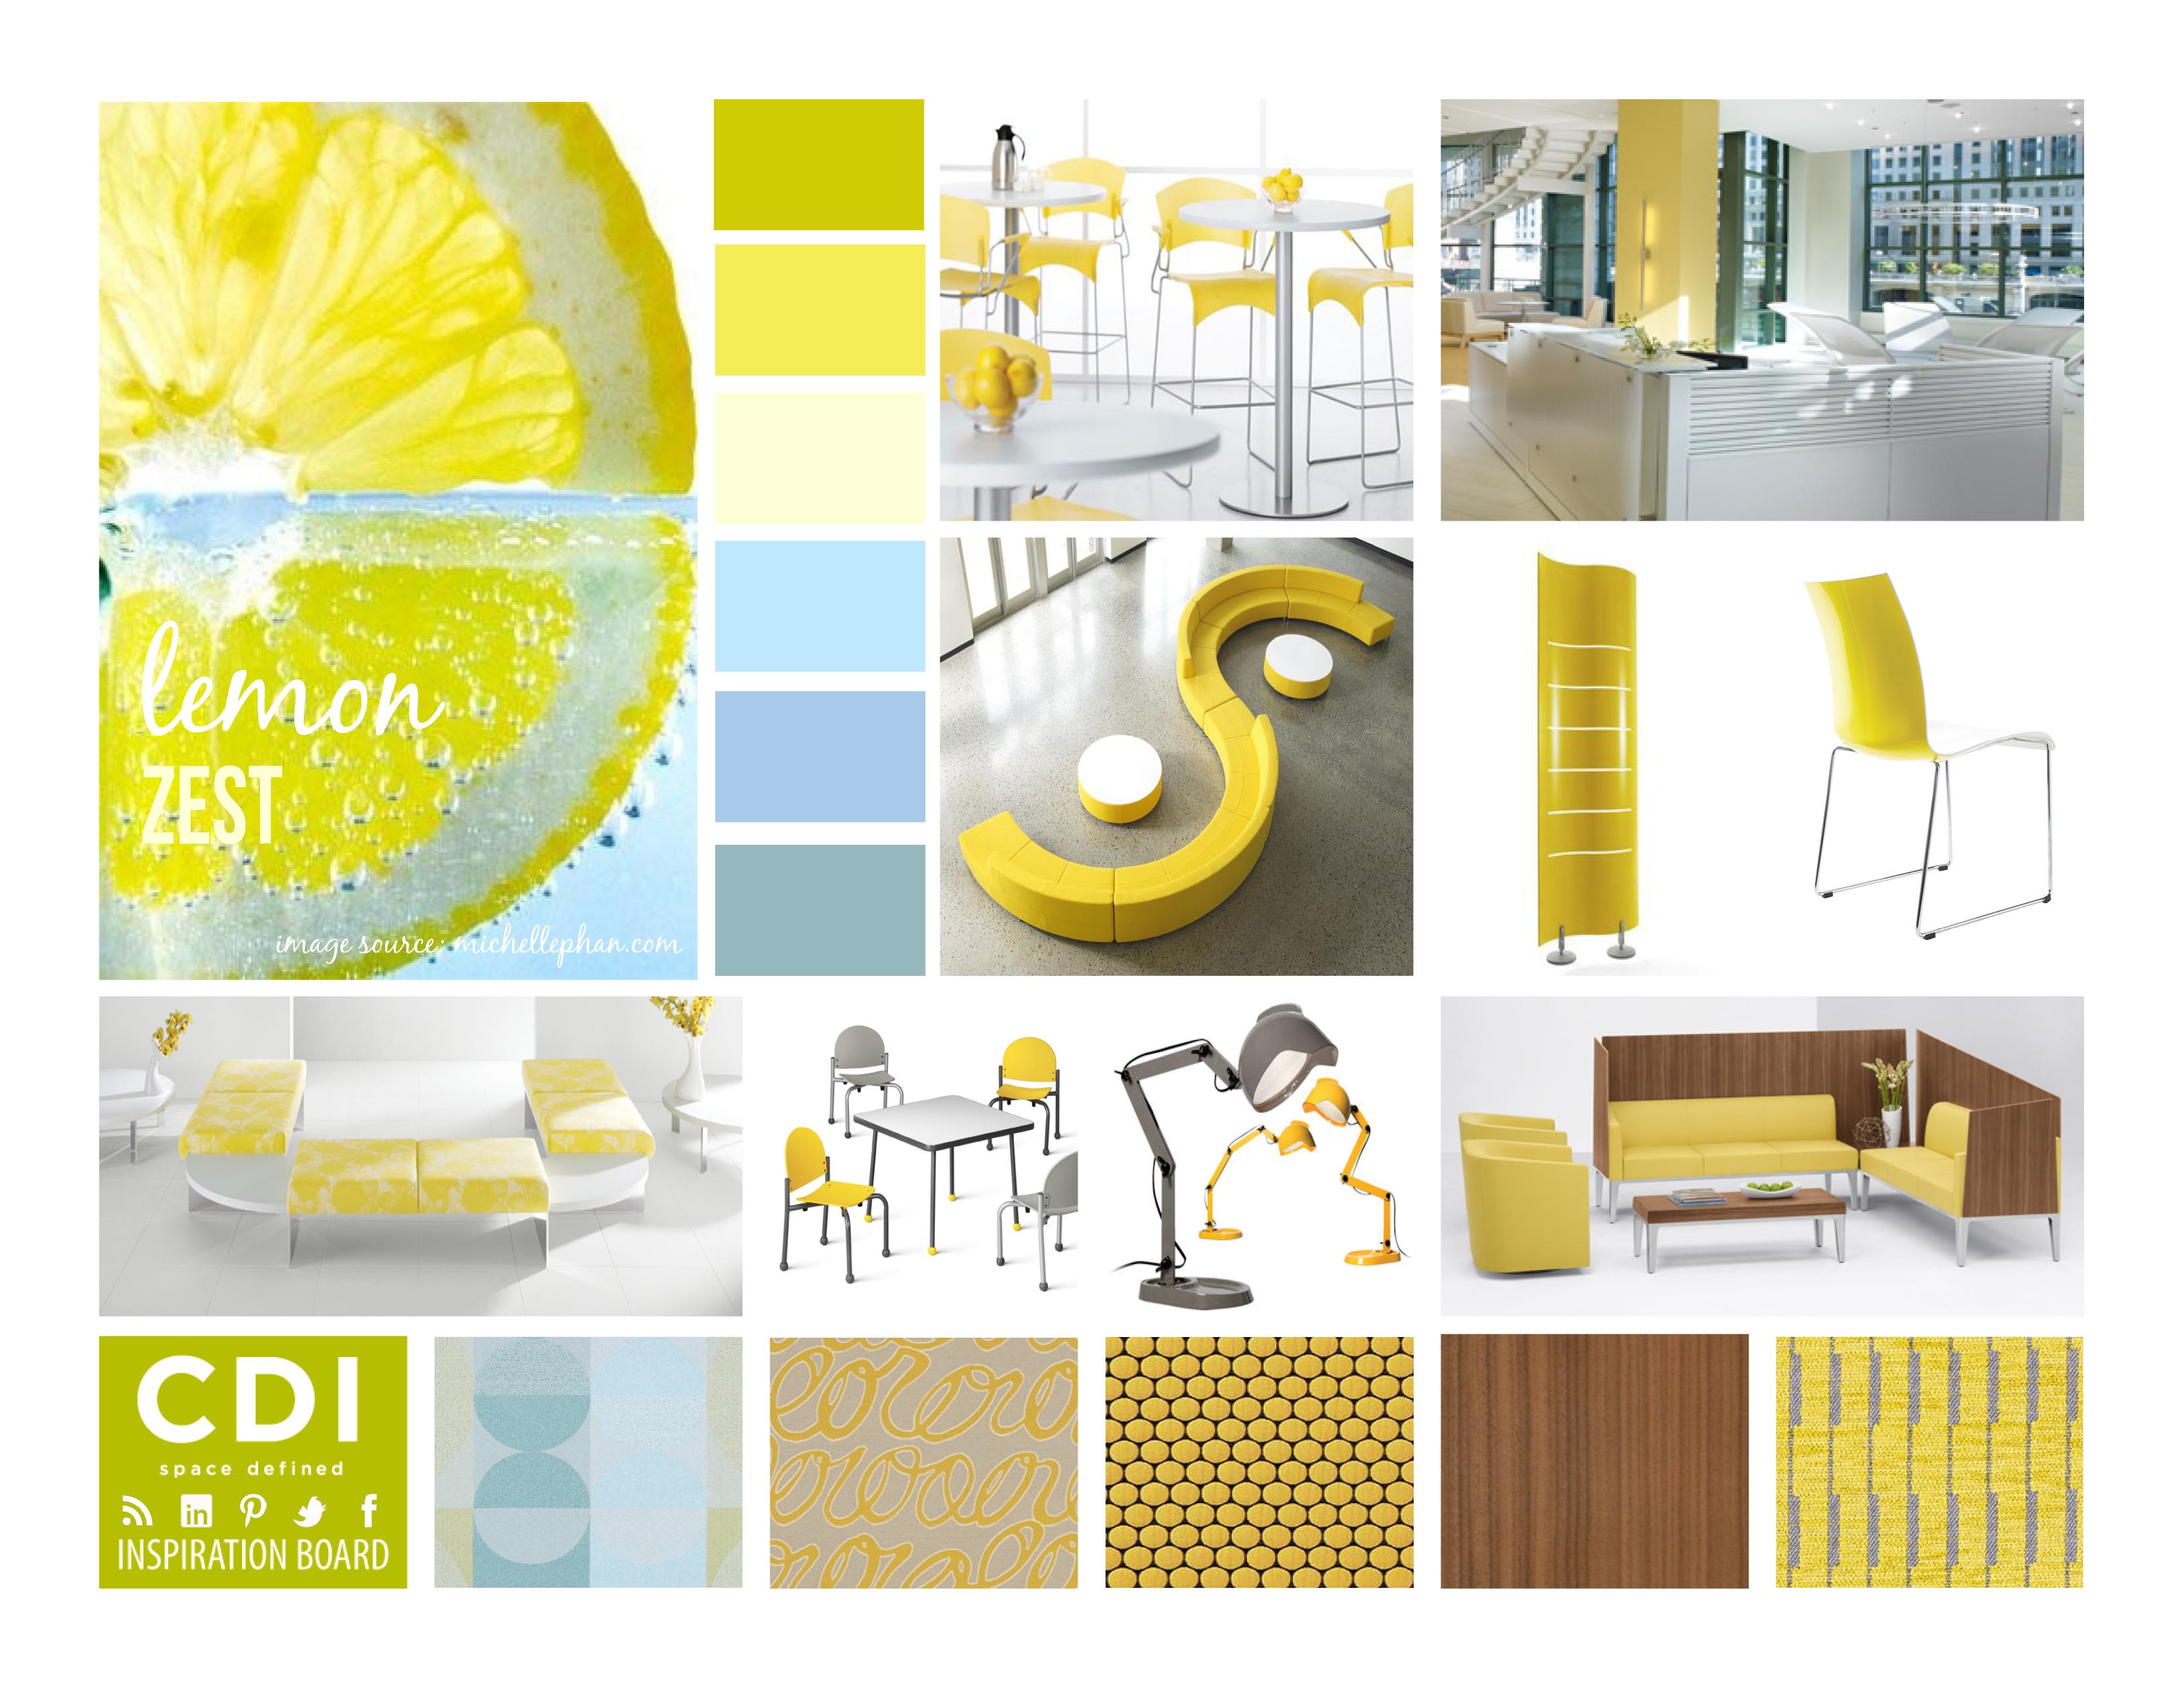 Cdi inspiration board lemon zest for Cdi interior design